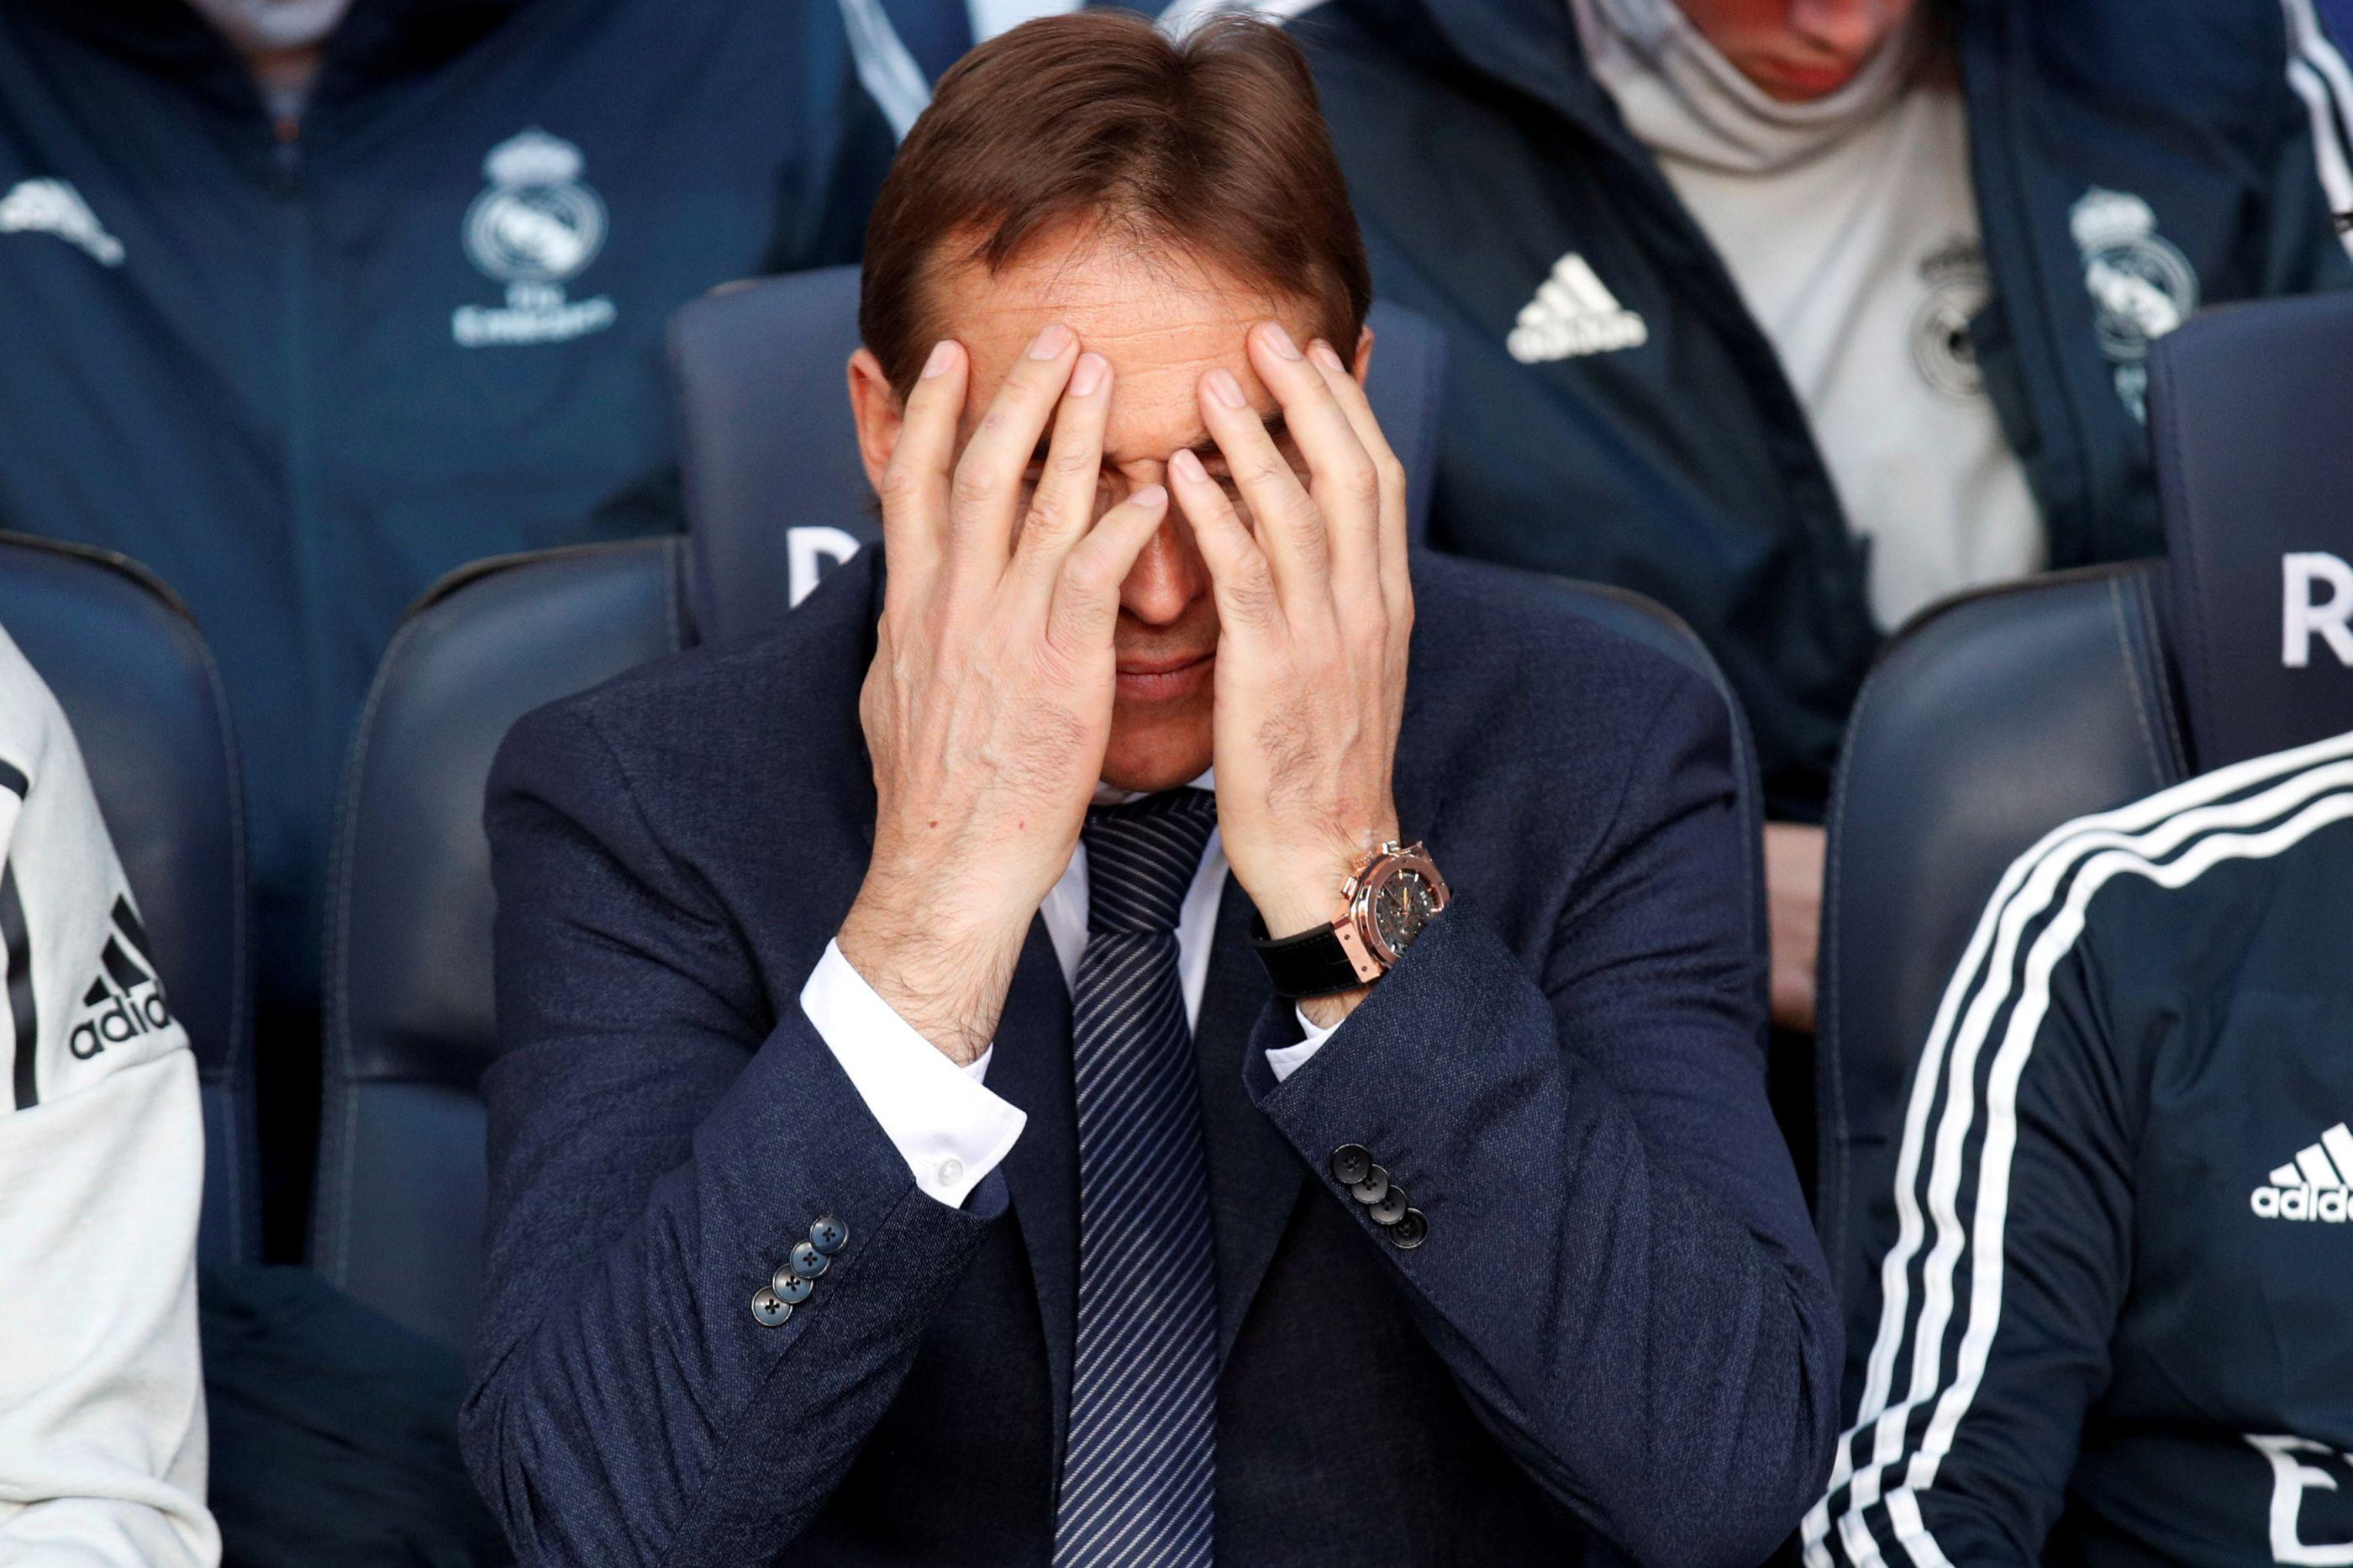 Real Madrid demite Lopetegui, avança a imprensa espanhola